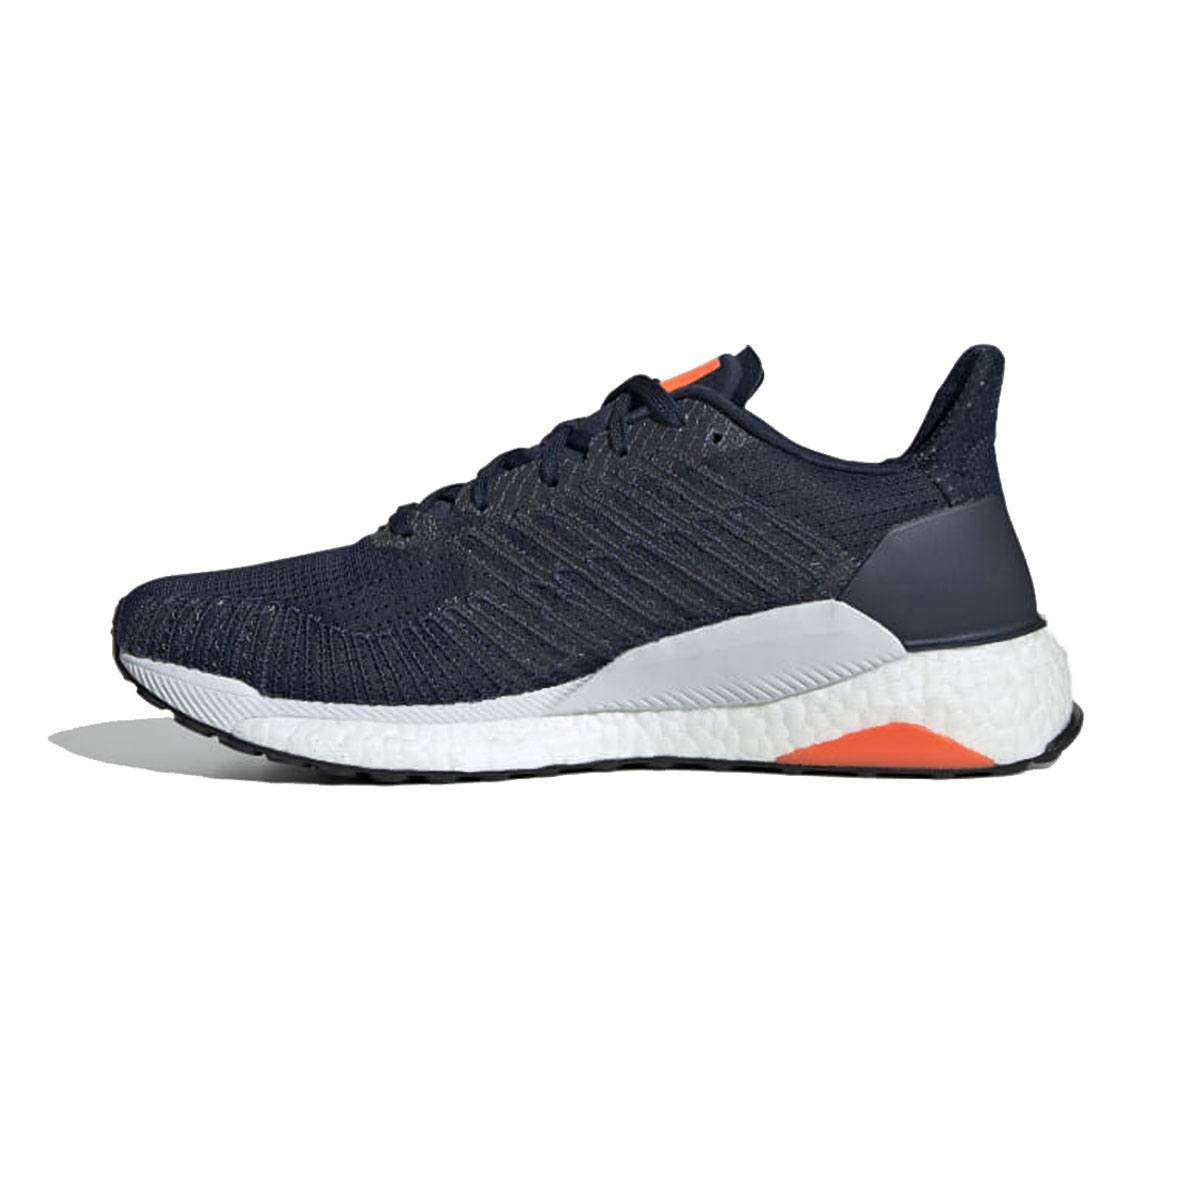 Tênis Adidas Solar Boost 19 Masculino